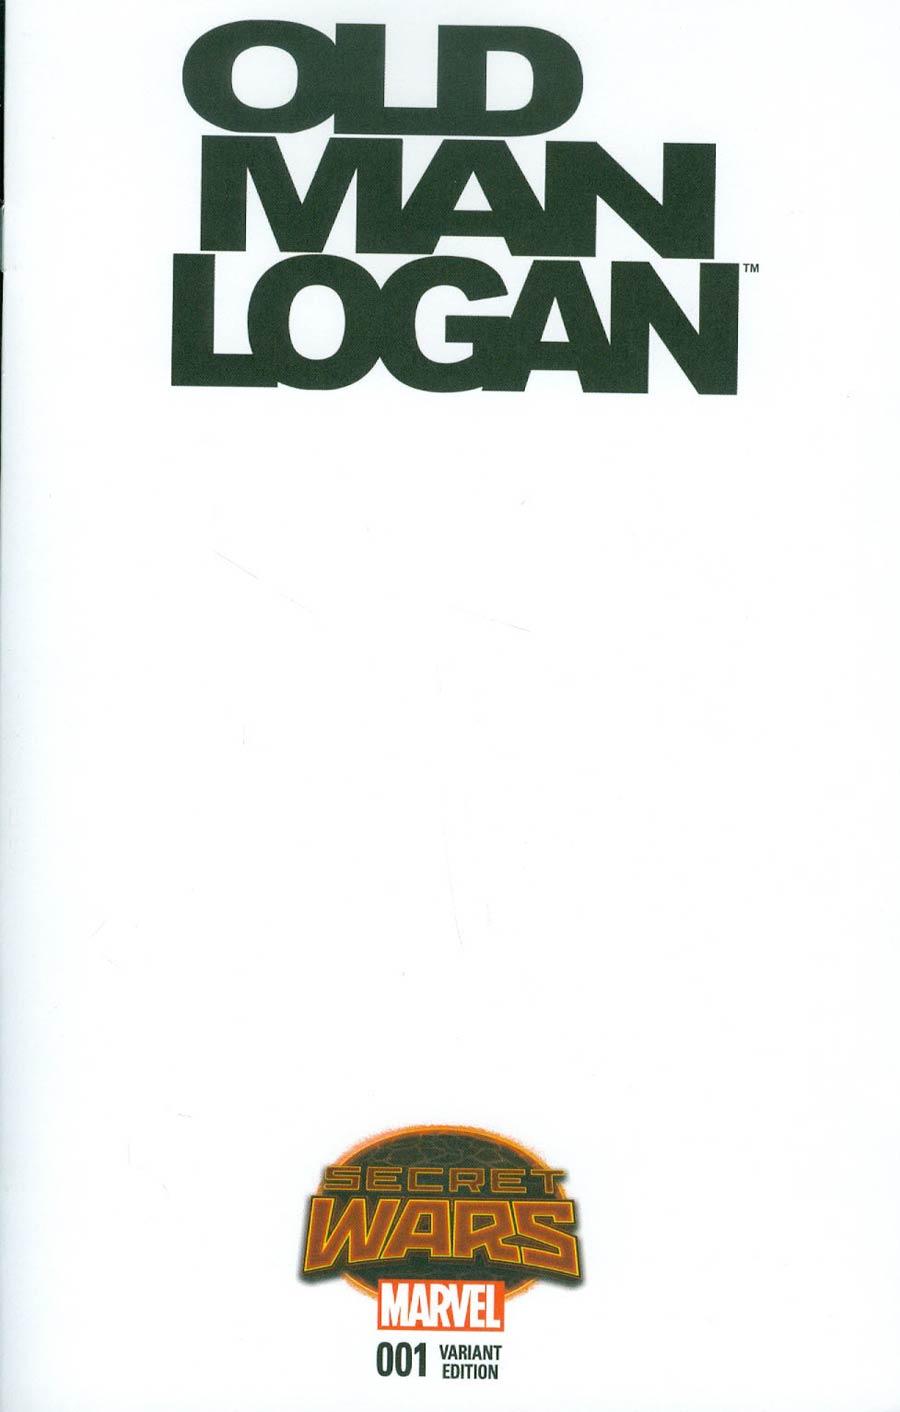 Old Man Logan #1 Cover C Variant Blank Cover (Secret Wars Warzones Tie-In)